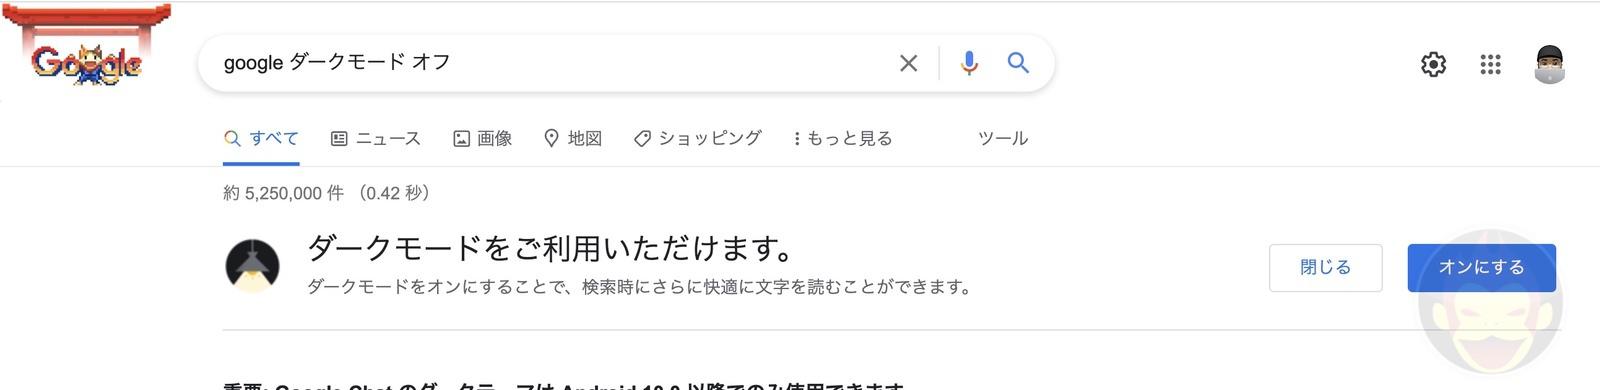 How to fix dark mode on google chrome 08